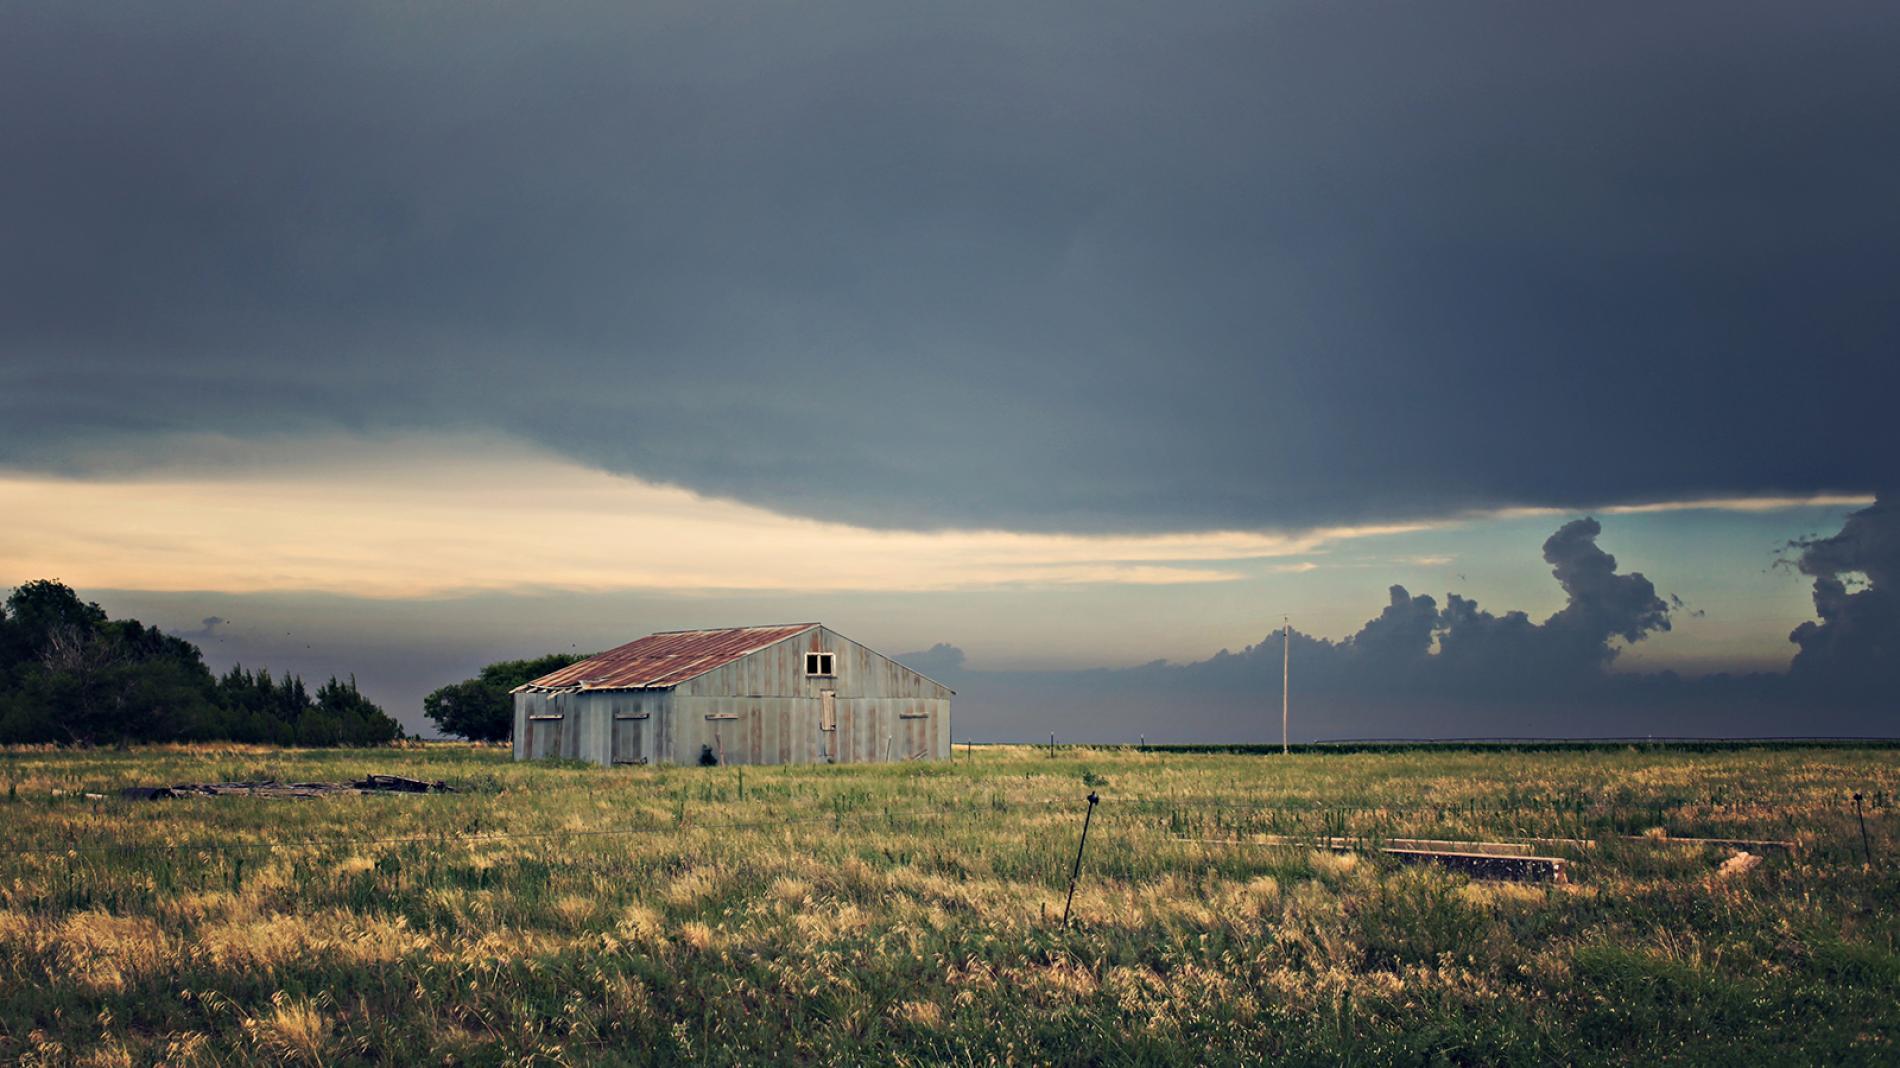 oklahoma-landscape.ngsversion.1432056777846.adapt.1900.1.jpg